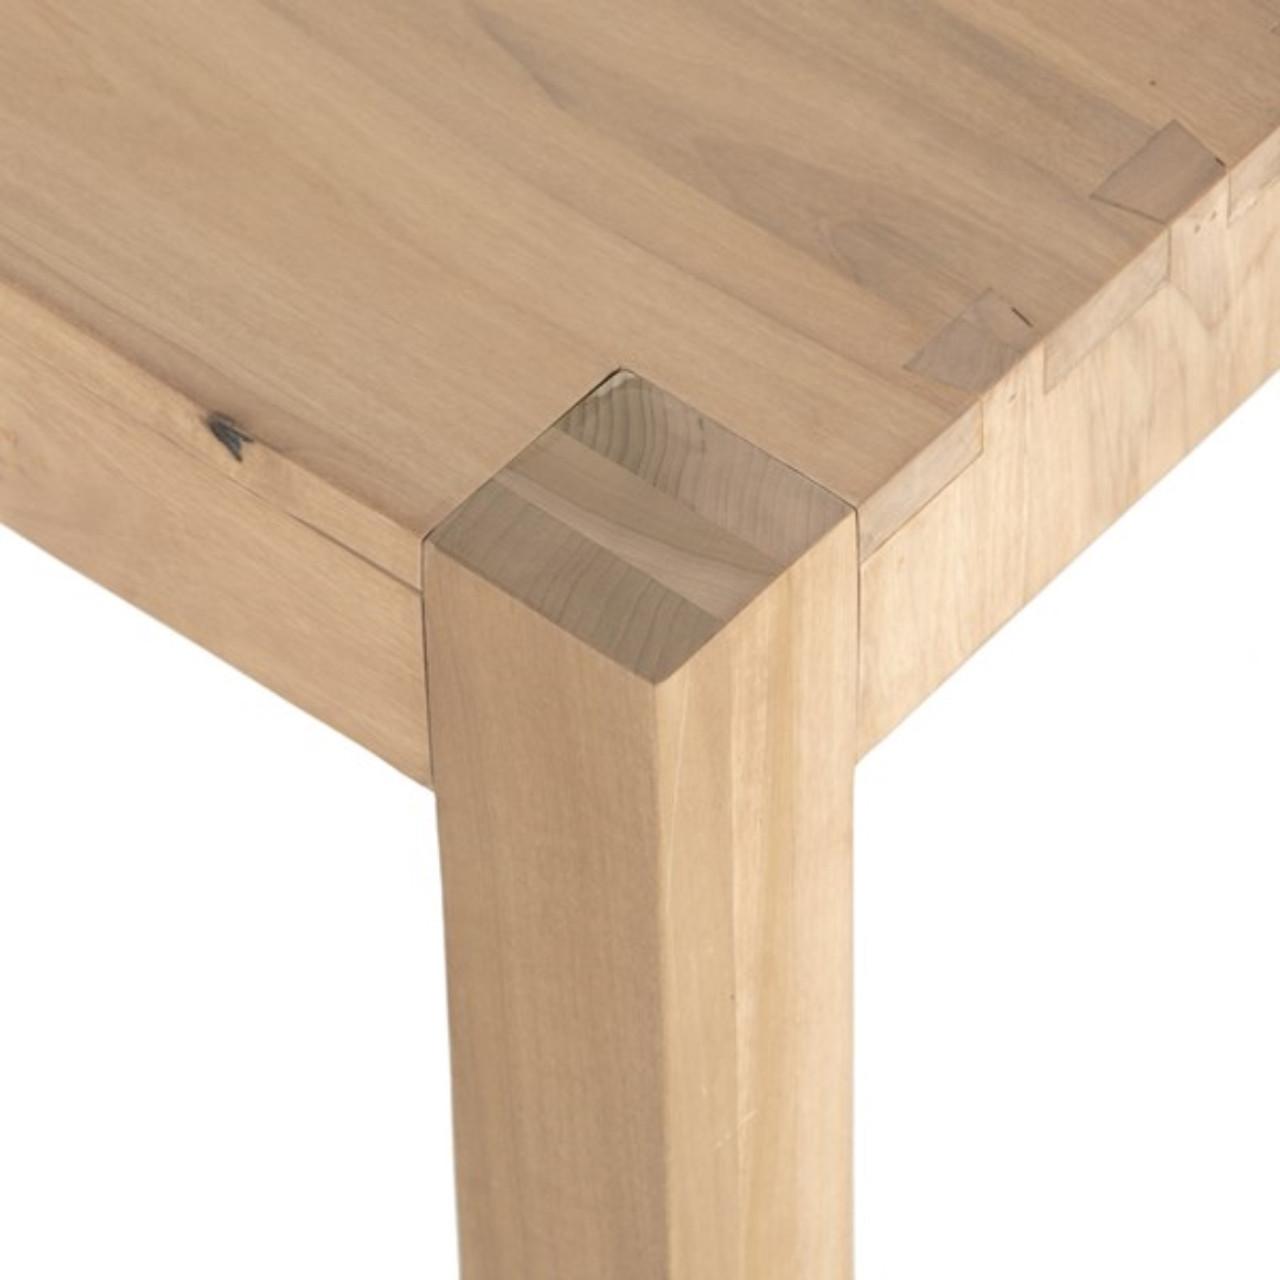 Elands Dining Bench - Dry Wash Poplar